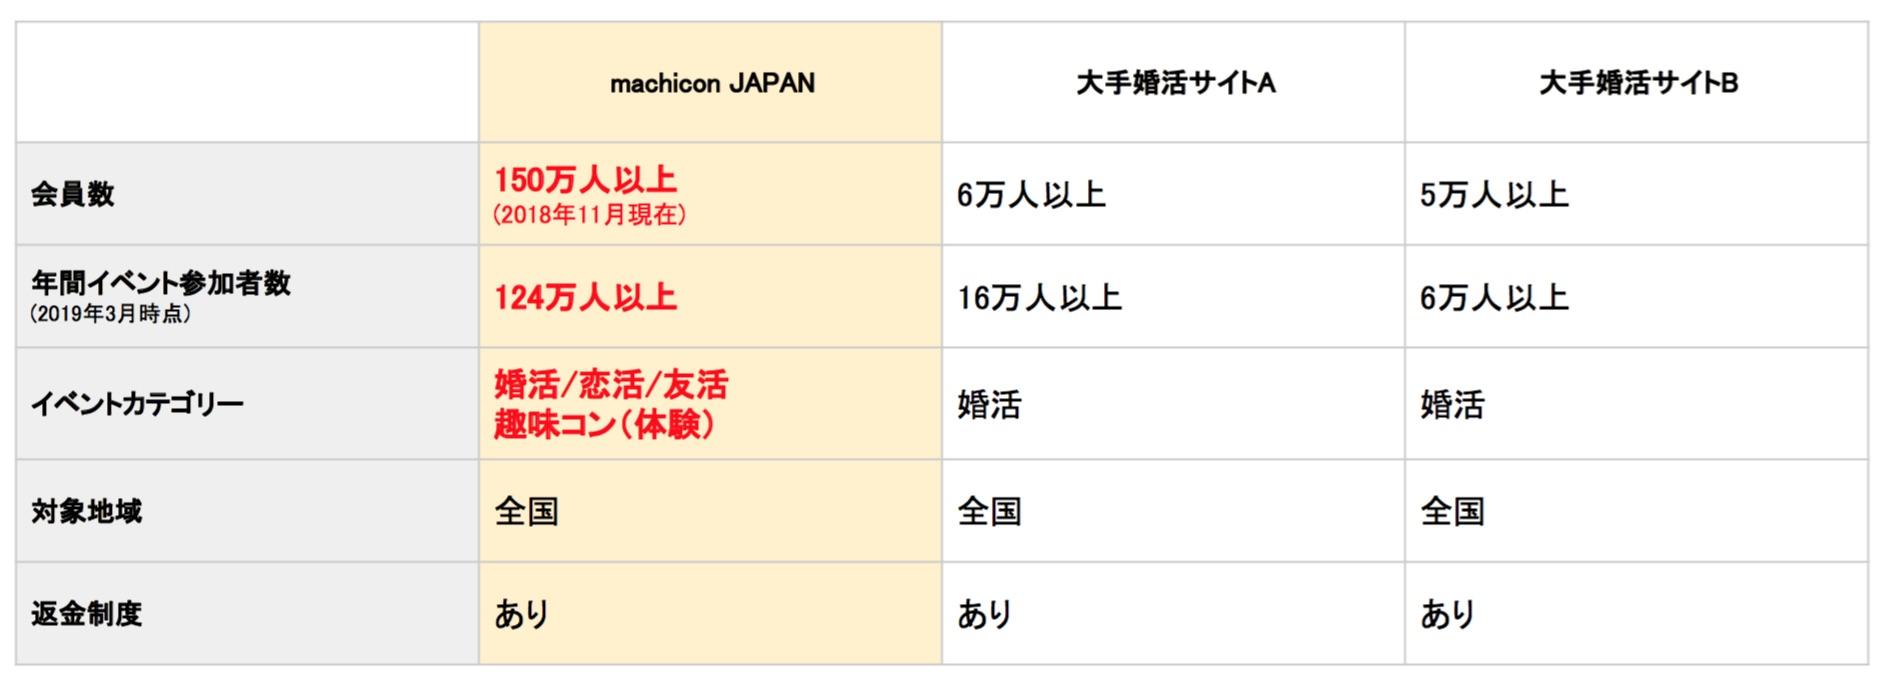 machicon JAPANと他社との料金比較表